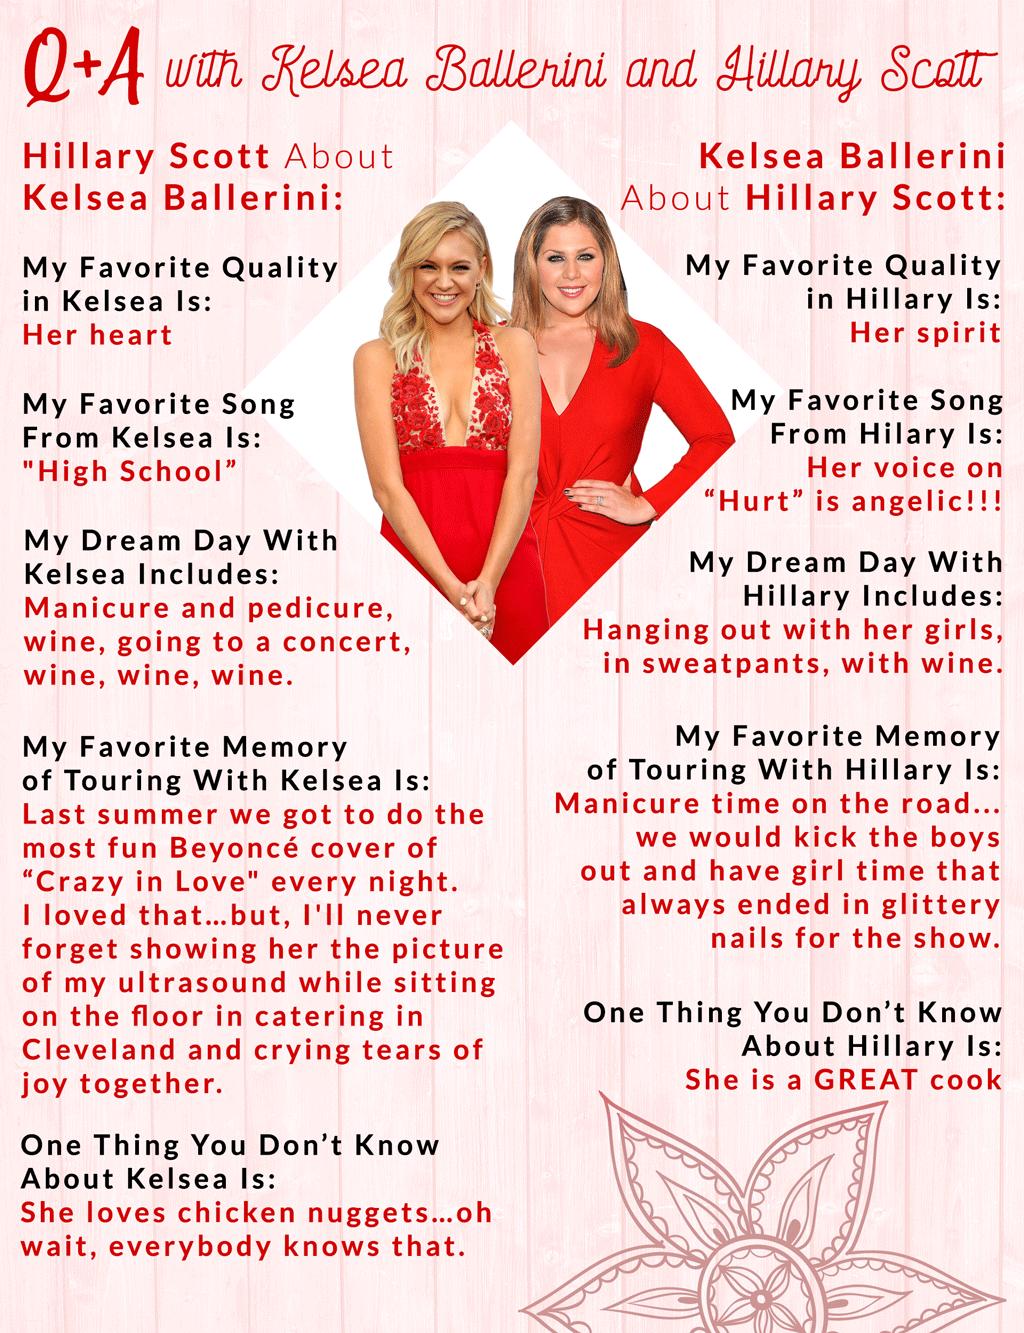 Q & A, Kelsea Ballerini, Hillary Scott